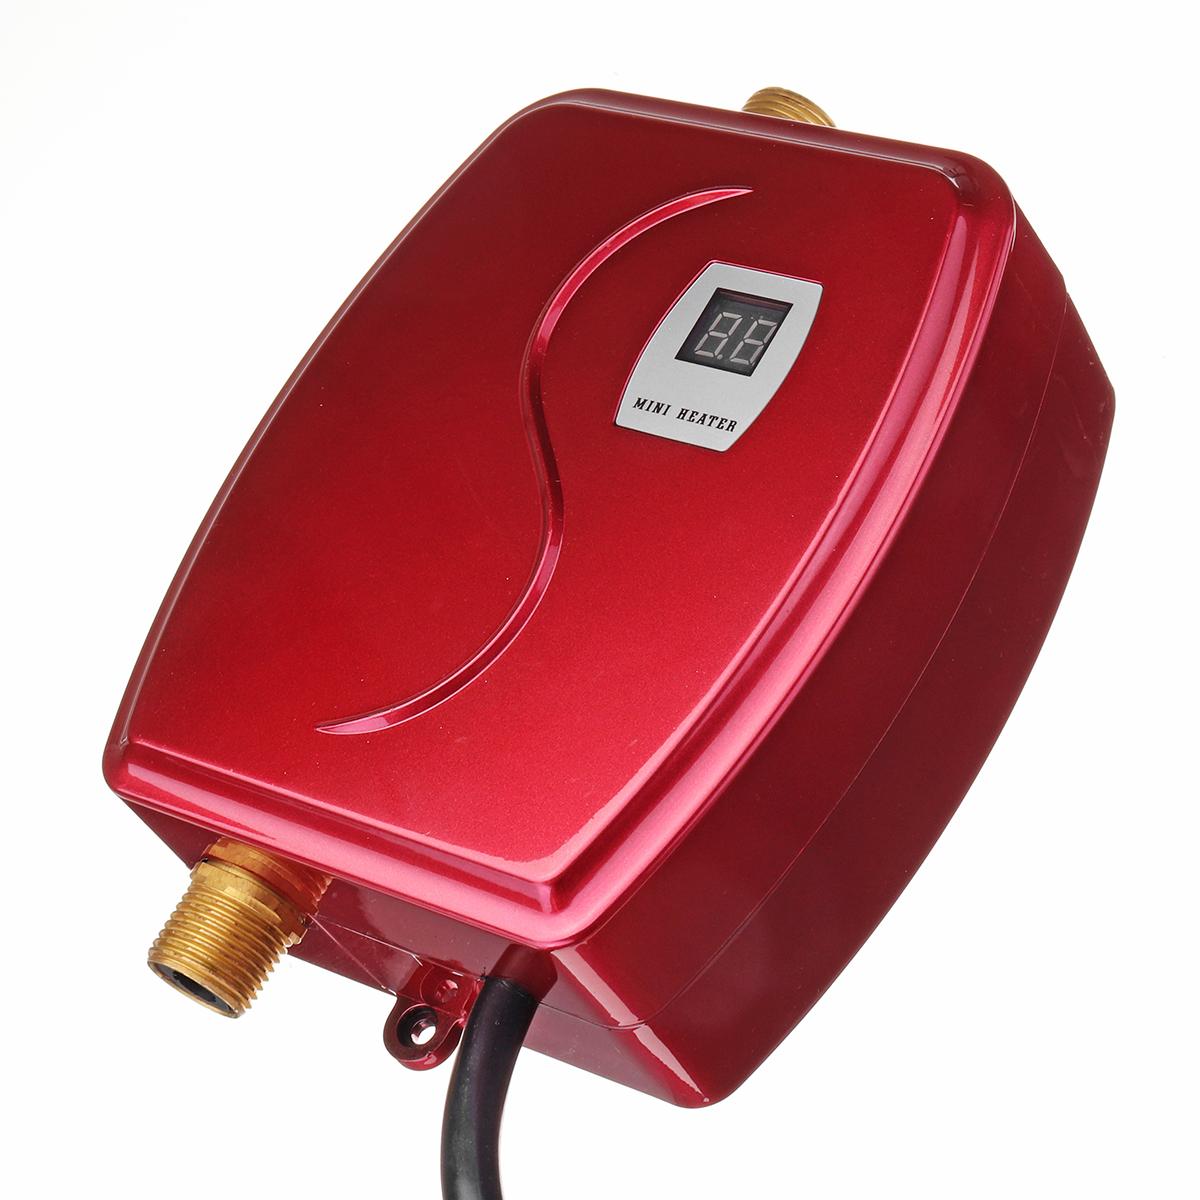 Mini tankless water heater most secure truck tool box